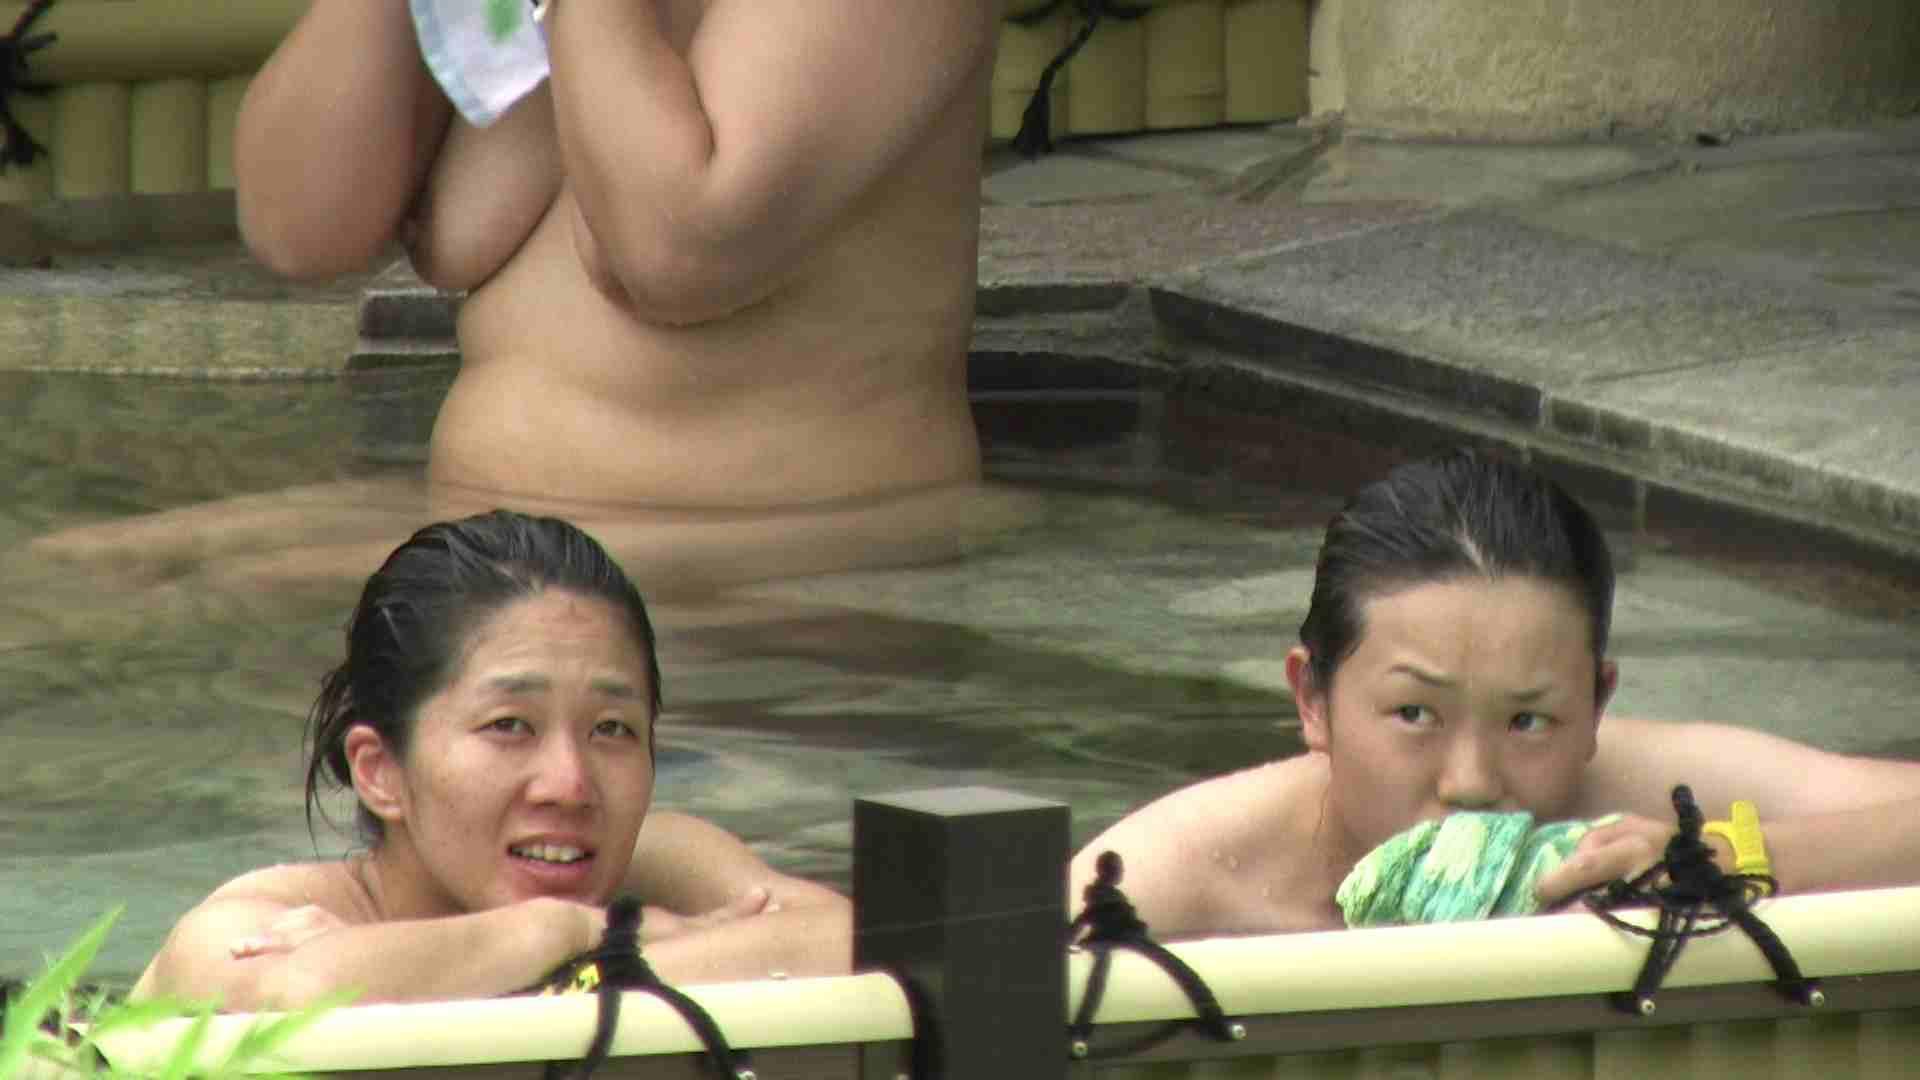 Aquaな露天風呂Vol.205 OLセックス 覗き性交動画流出 105画像 32